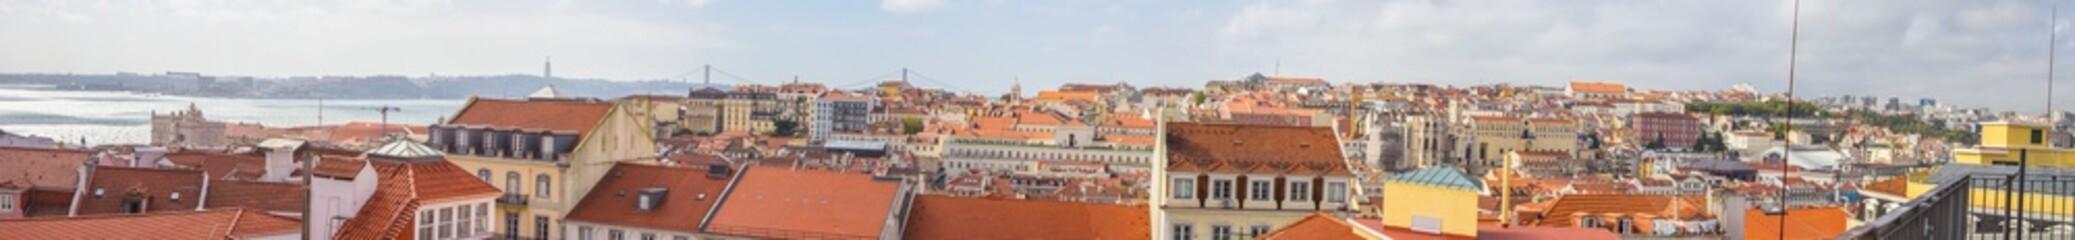 Miradouro de Santa Catarina Lisboa Panorâmico (Lissabon)